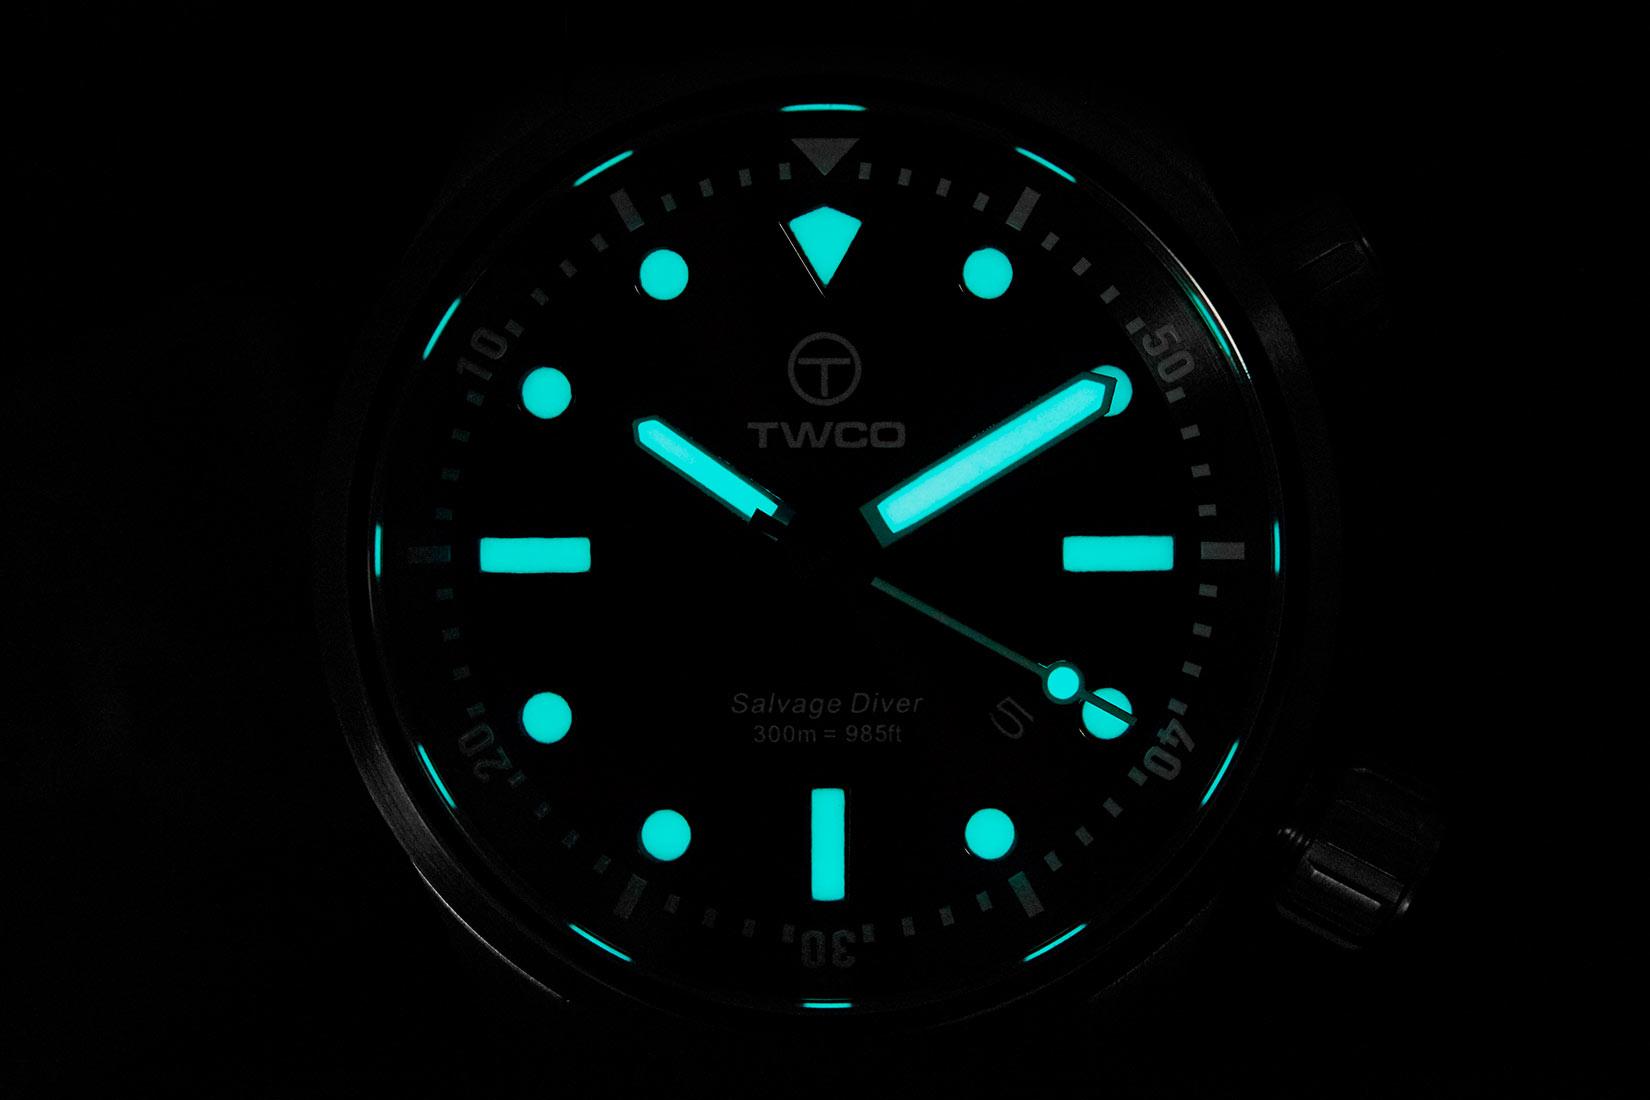 TWCO's new Salvage Diver TWCO-Salvage-Diver-Lume